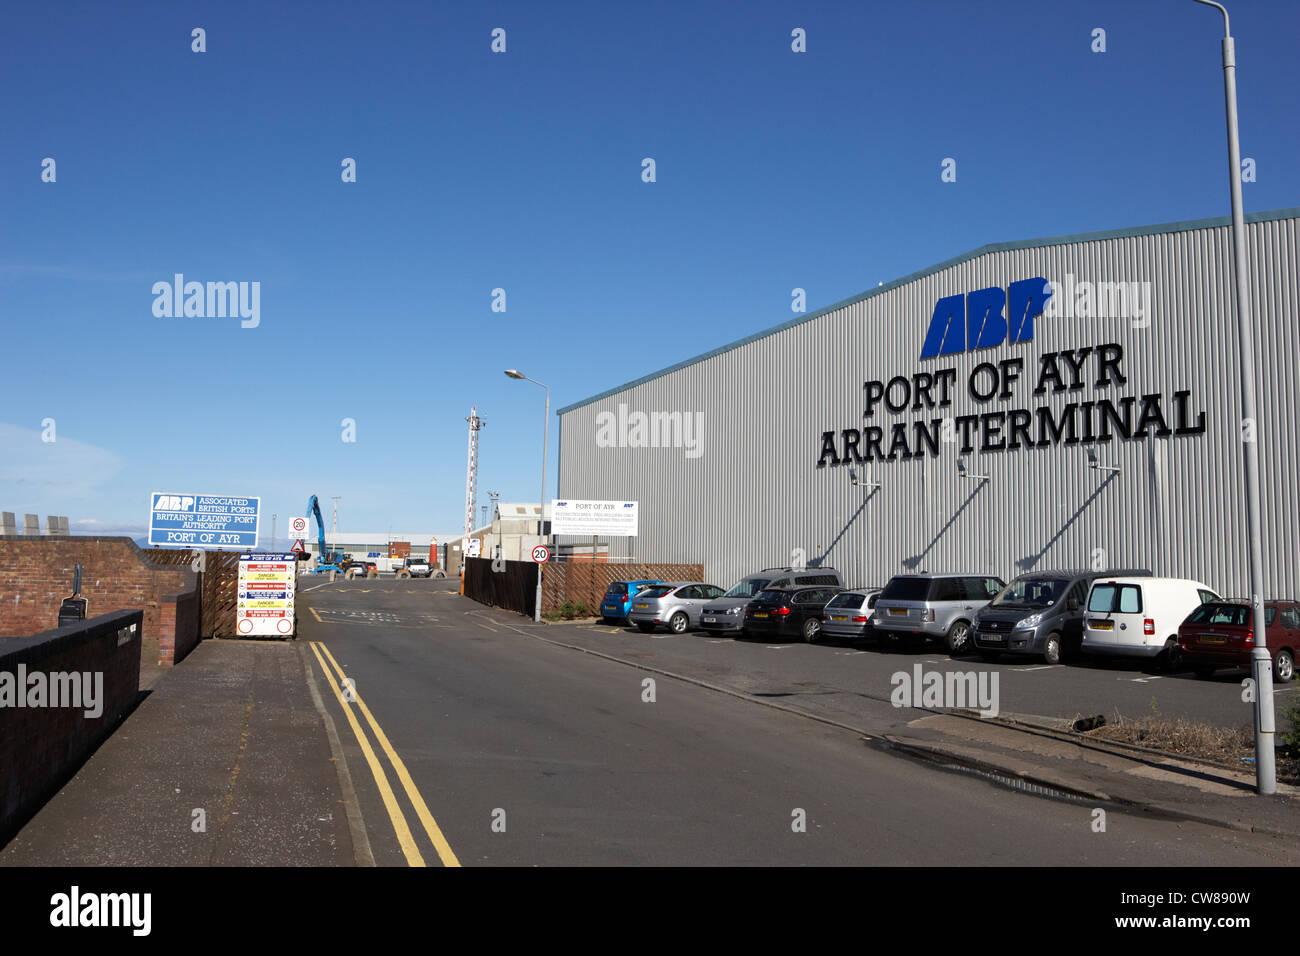 Port Of Ayr Arran Terminal South Ayrshire Scotland Uk United